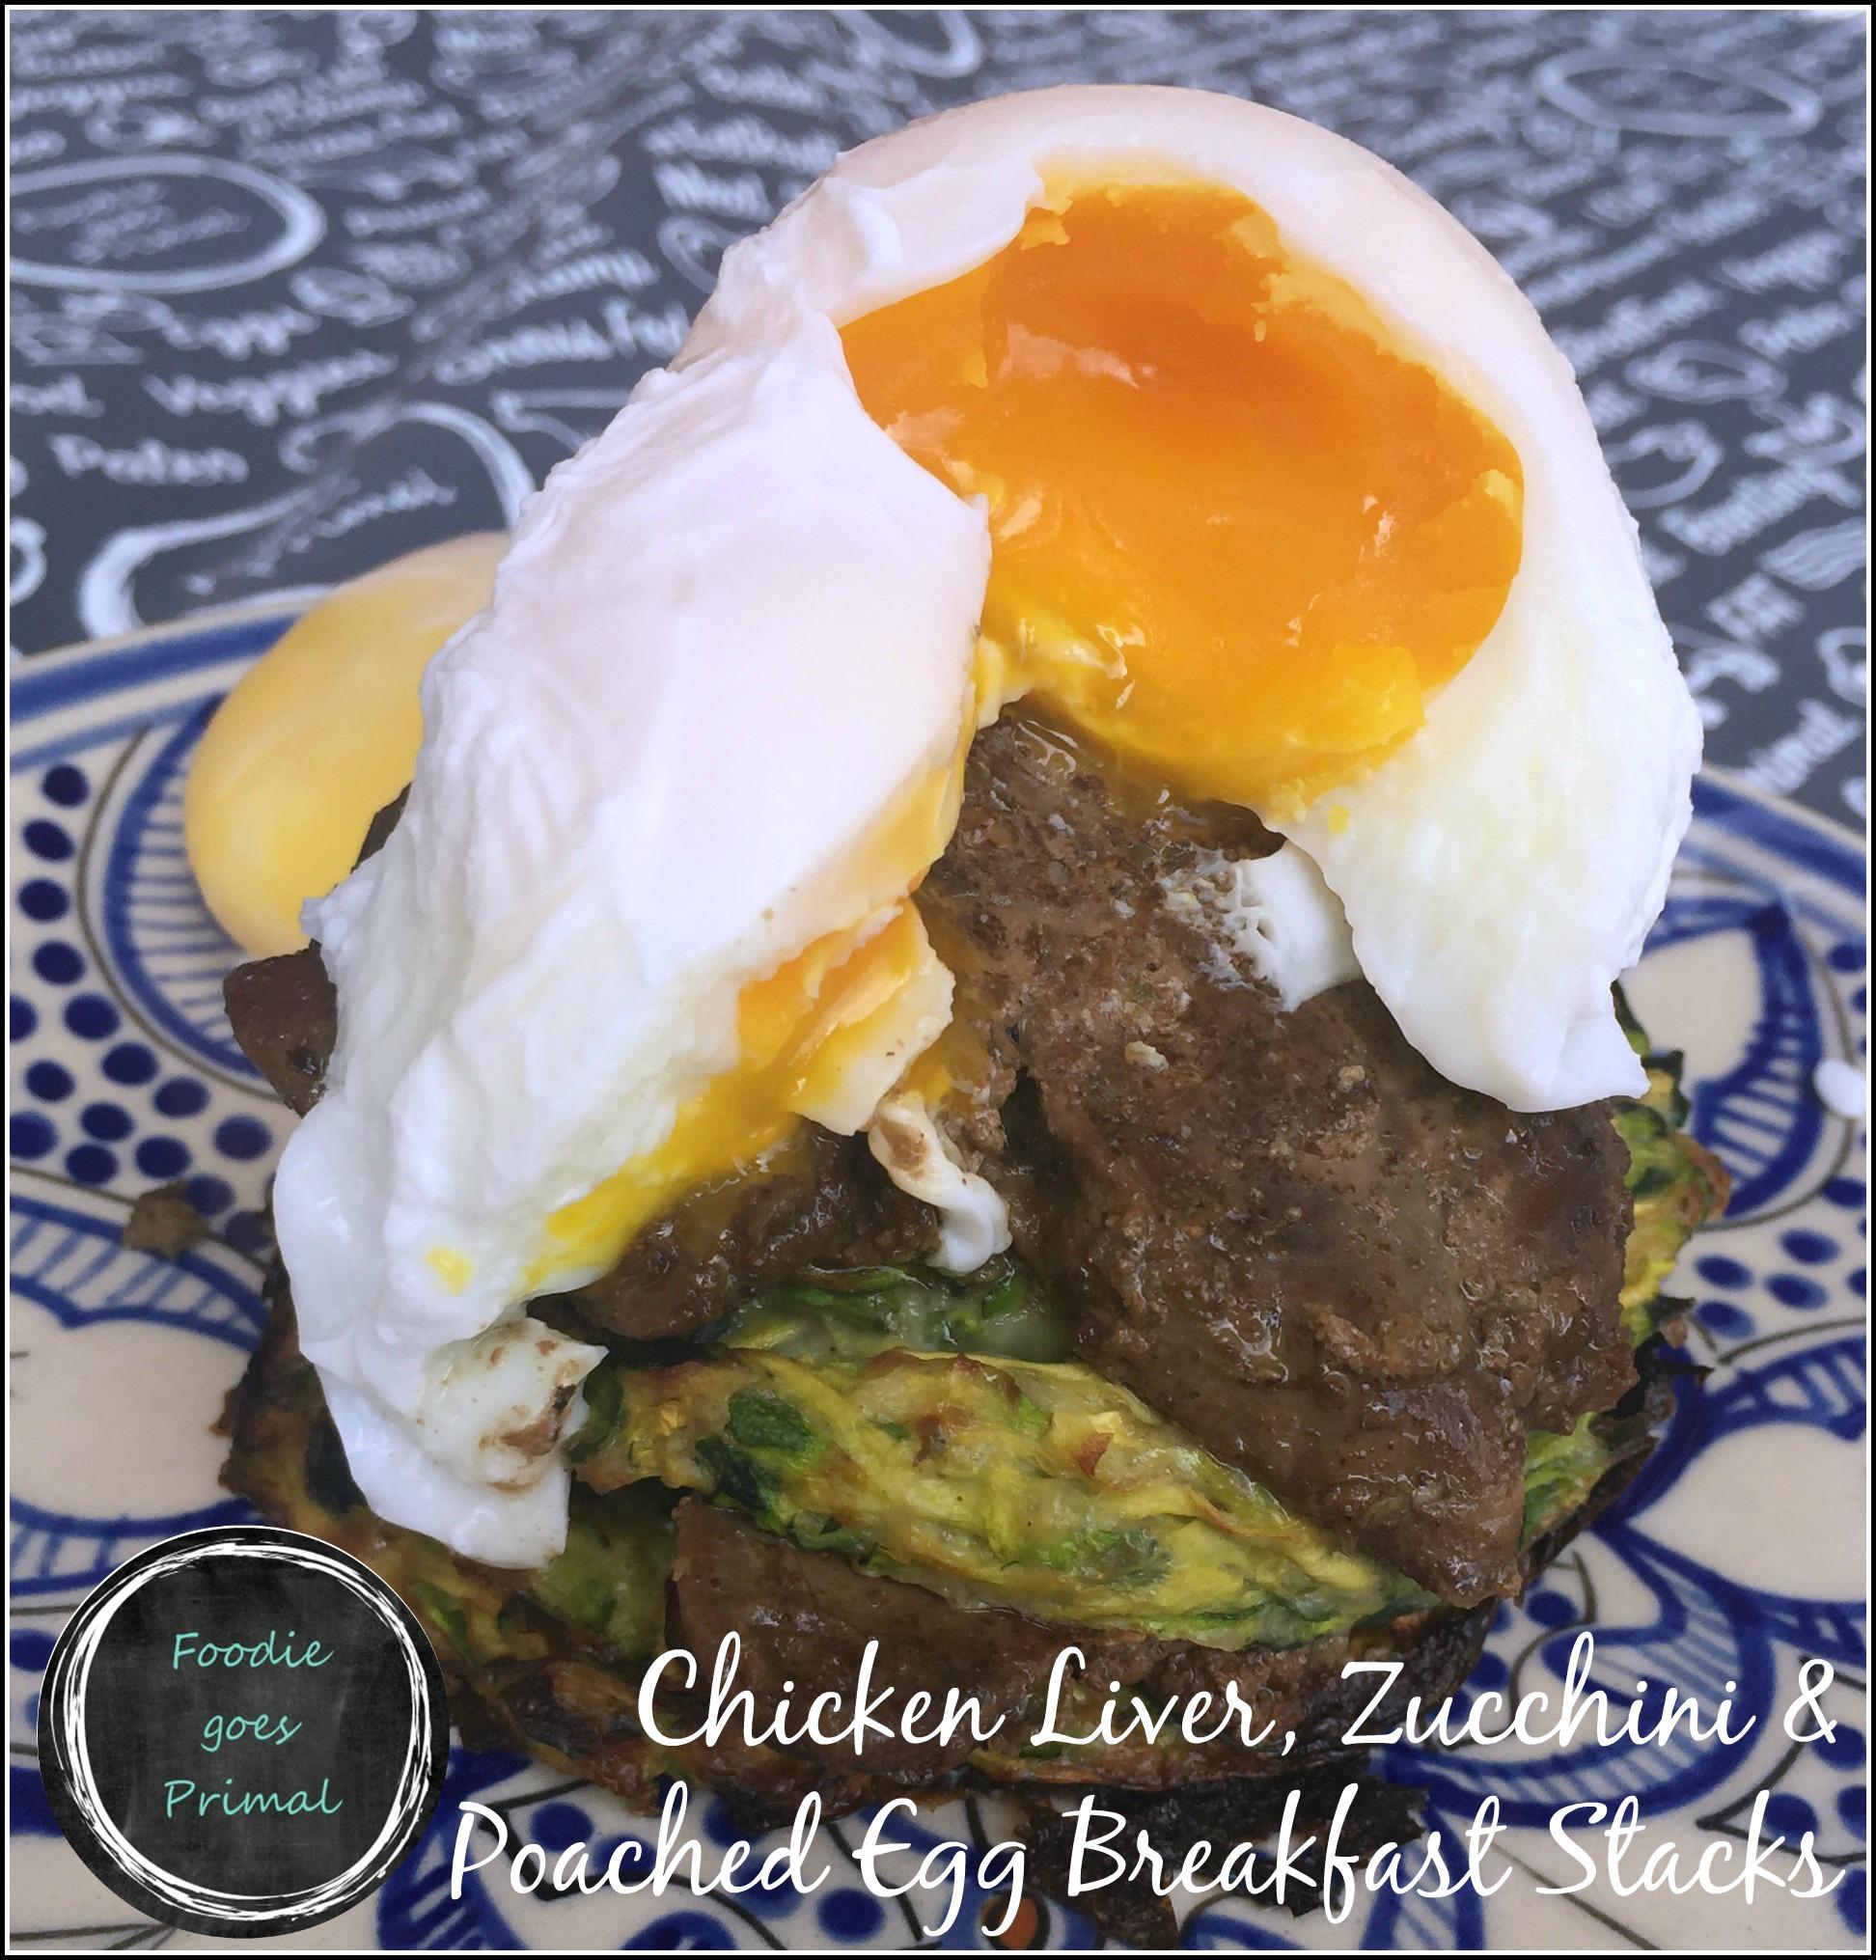 Chicken Liver, Zucchini & Poached Egg Breakfast Stacks {LCHF, Paleo, Dairy-Free}